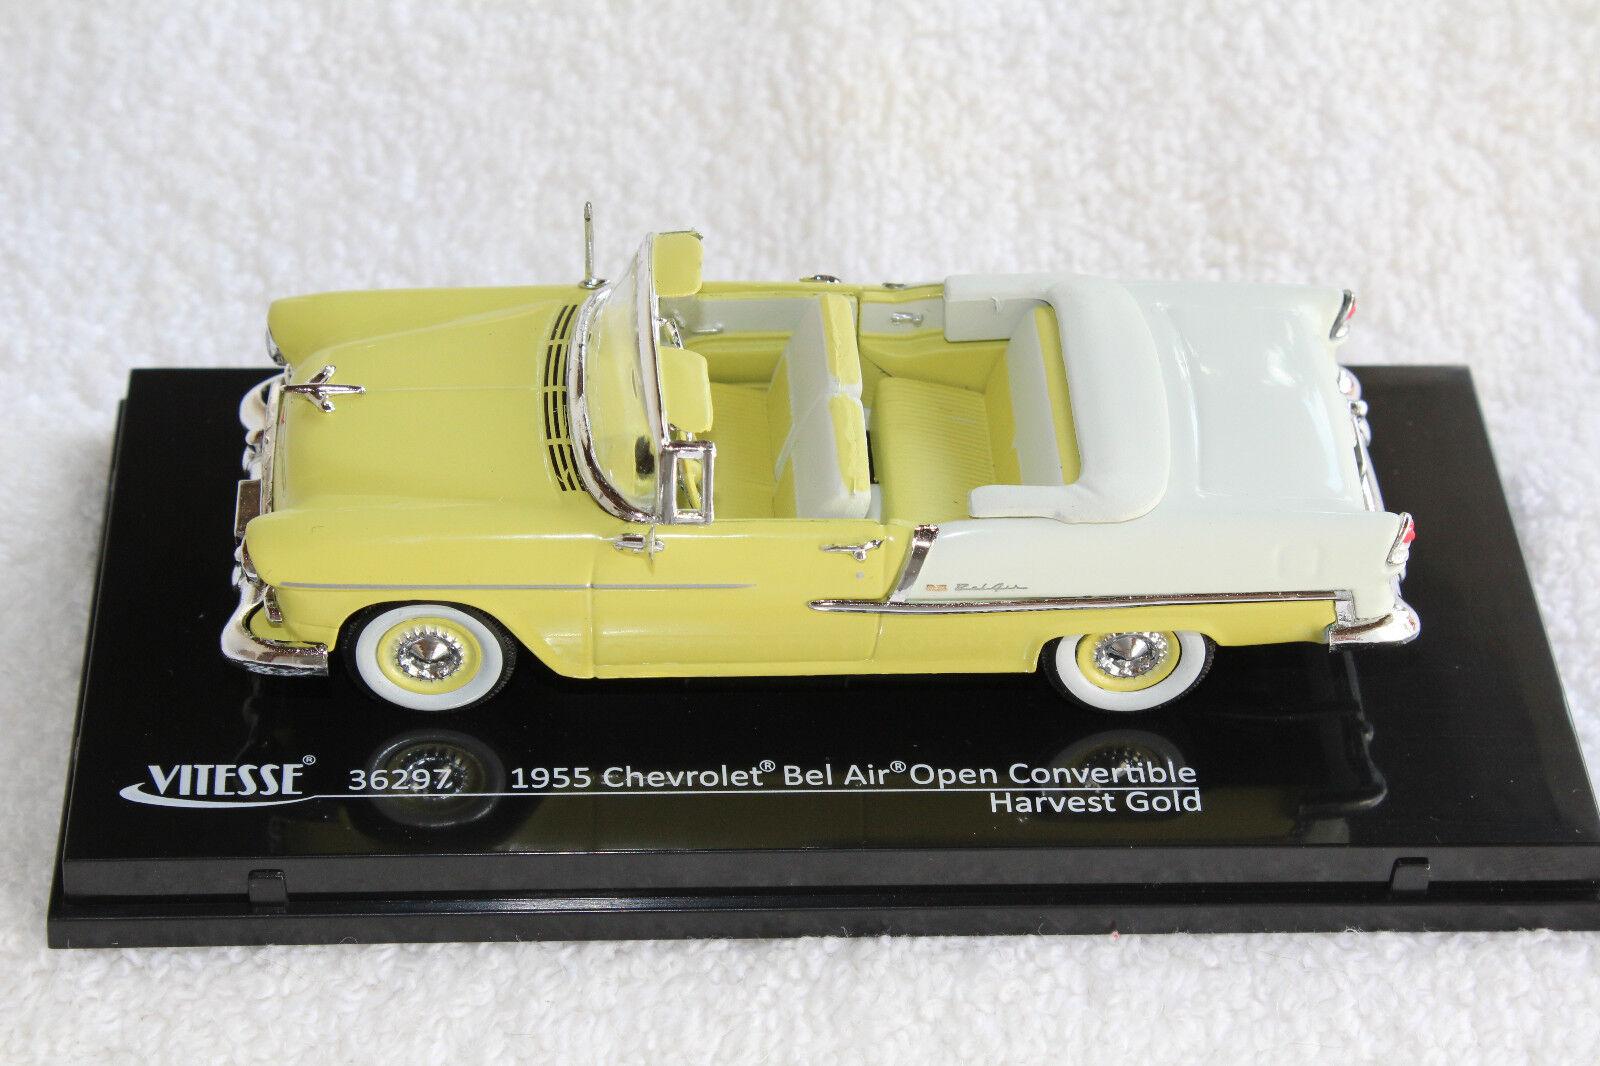 36297 1955 Chevrolet Bel Air Congreenible Car NEW IN BOX